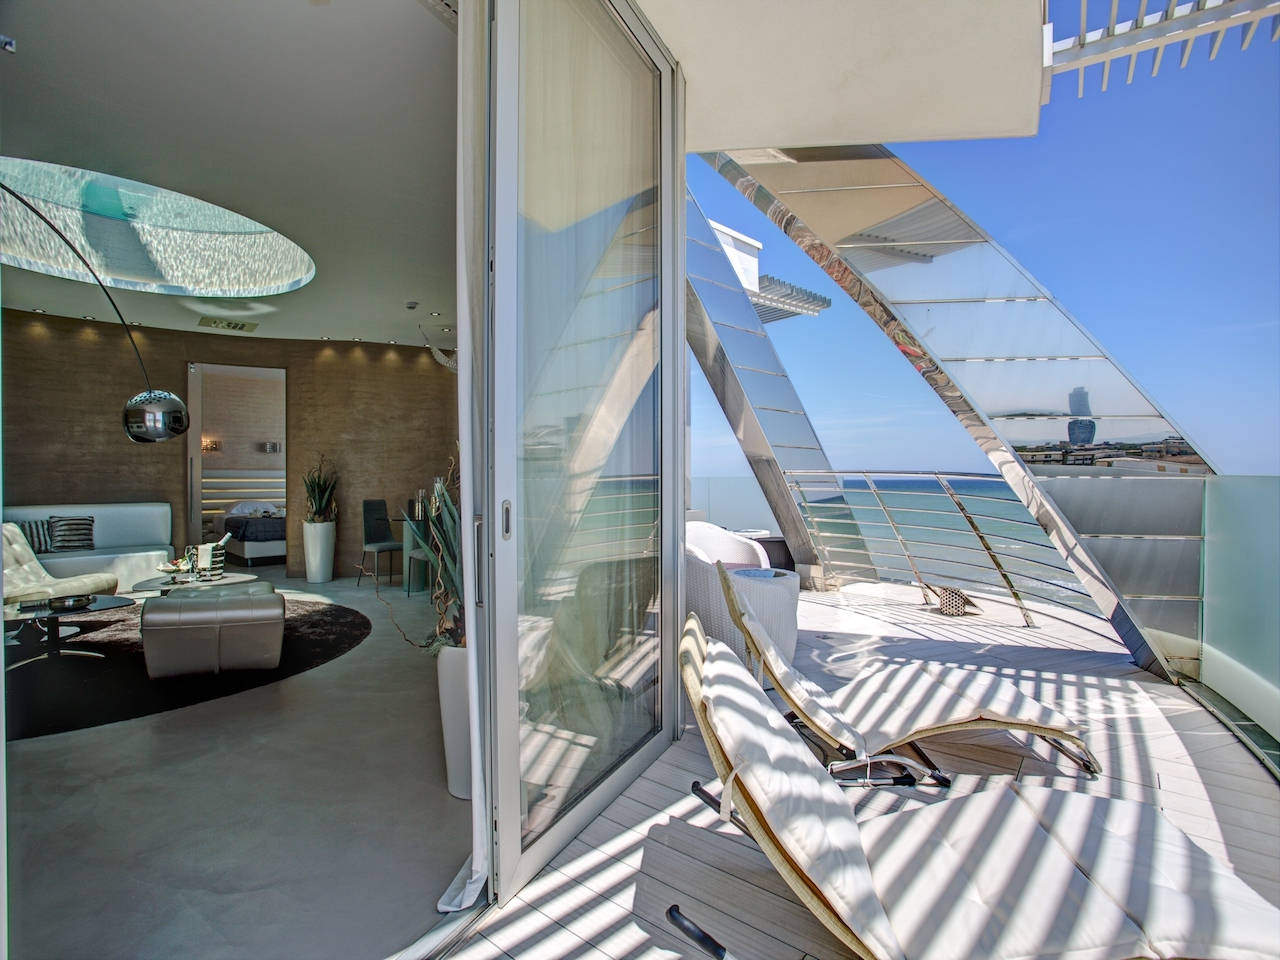 diamond-suite-terrazza-005-2048-x-1536 – Medicus Info